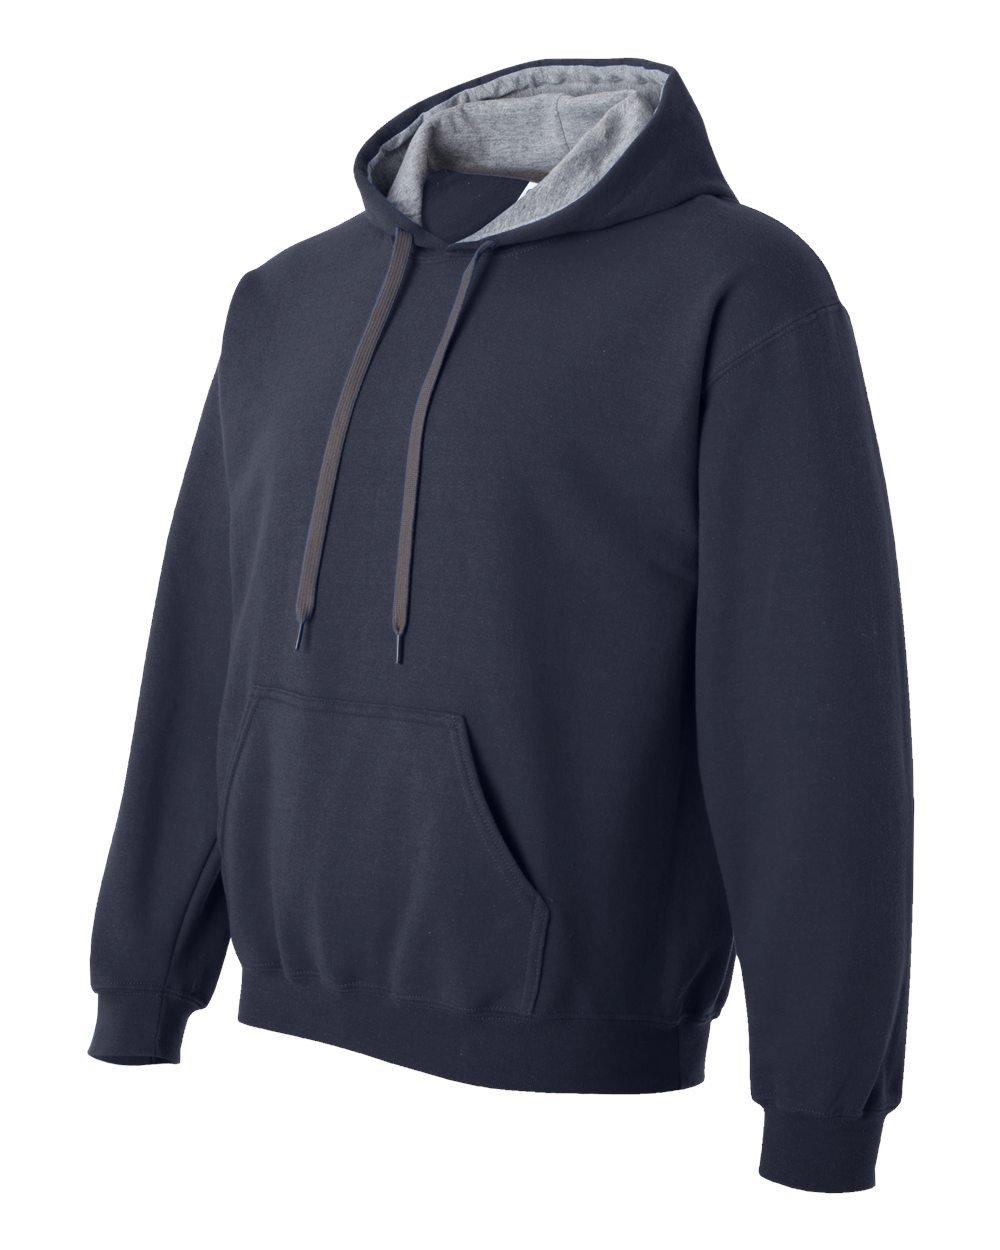 Gildan Gildan Gildan Heavy Blend Contrast Herren Kapuzenpullover   Hoodie   Kapuzensweater B00DGEZLN8 Kapuzenpullover Wartungsfähigkeit 593726